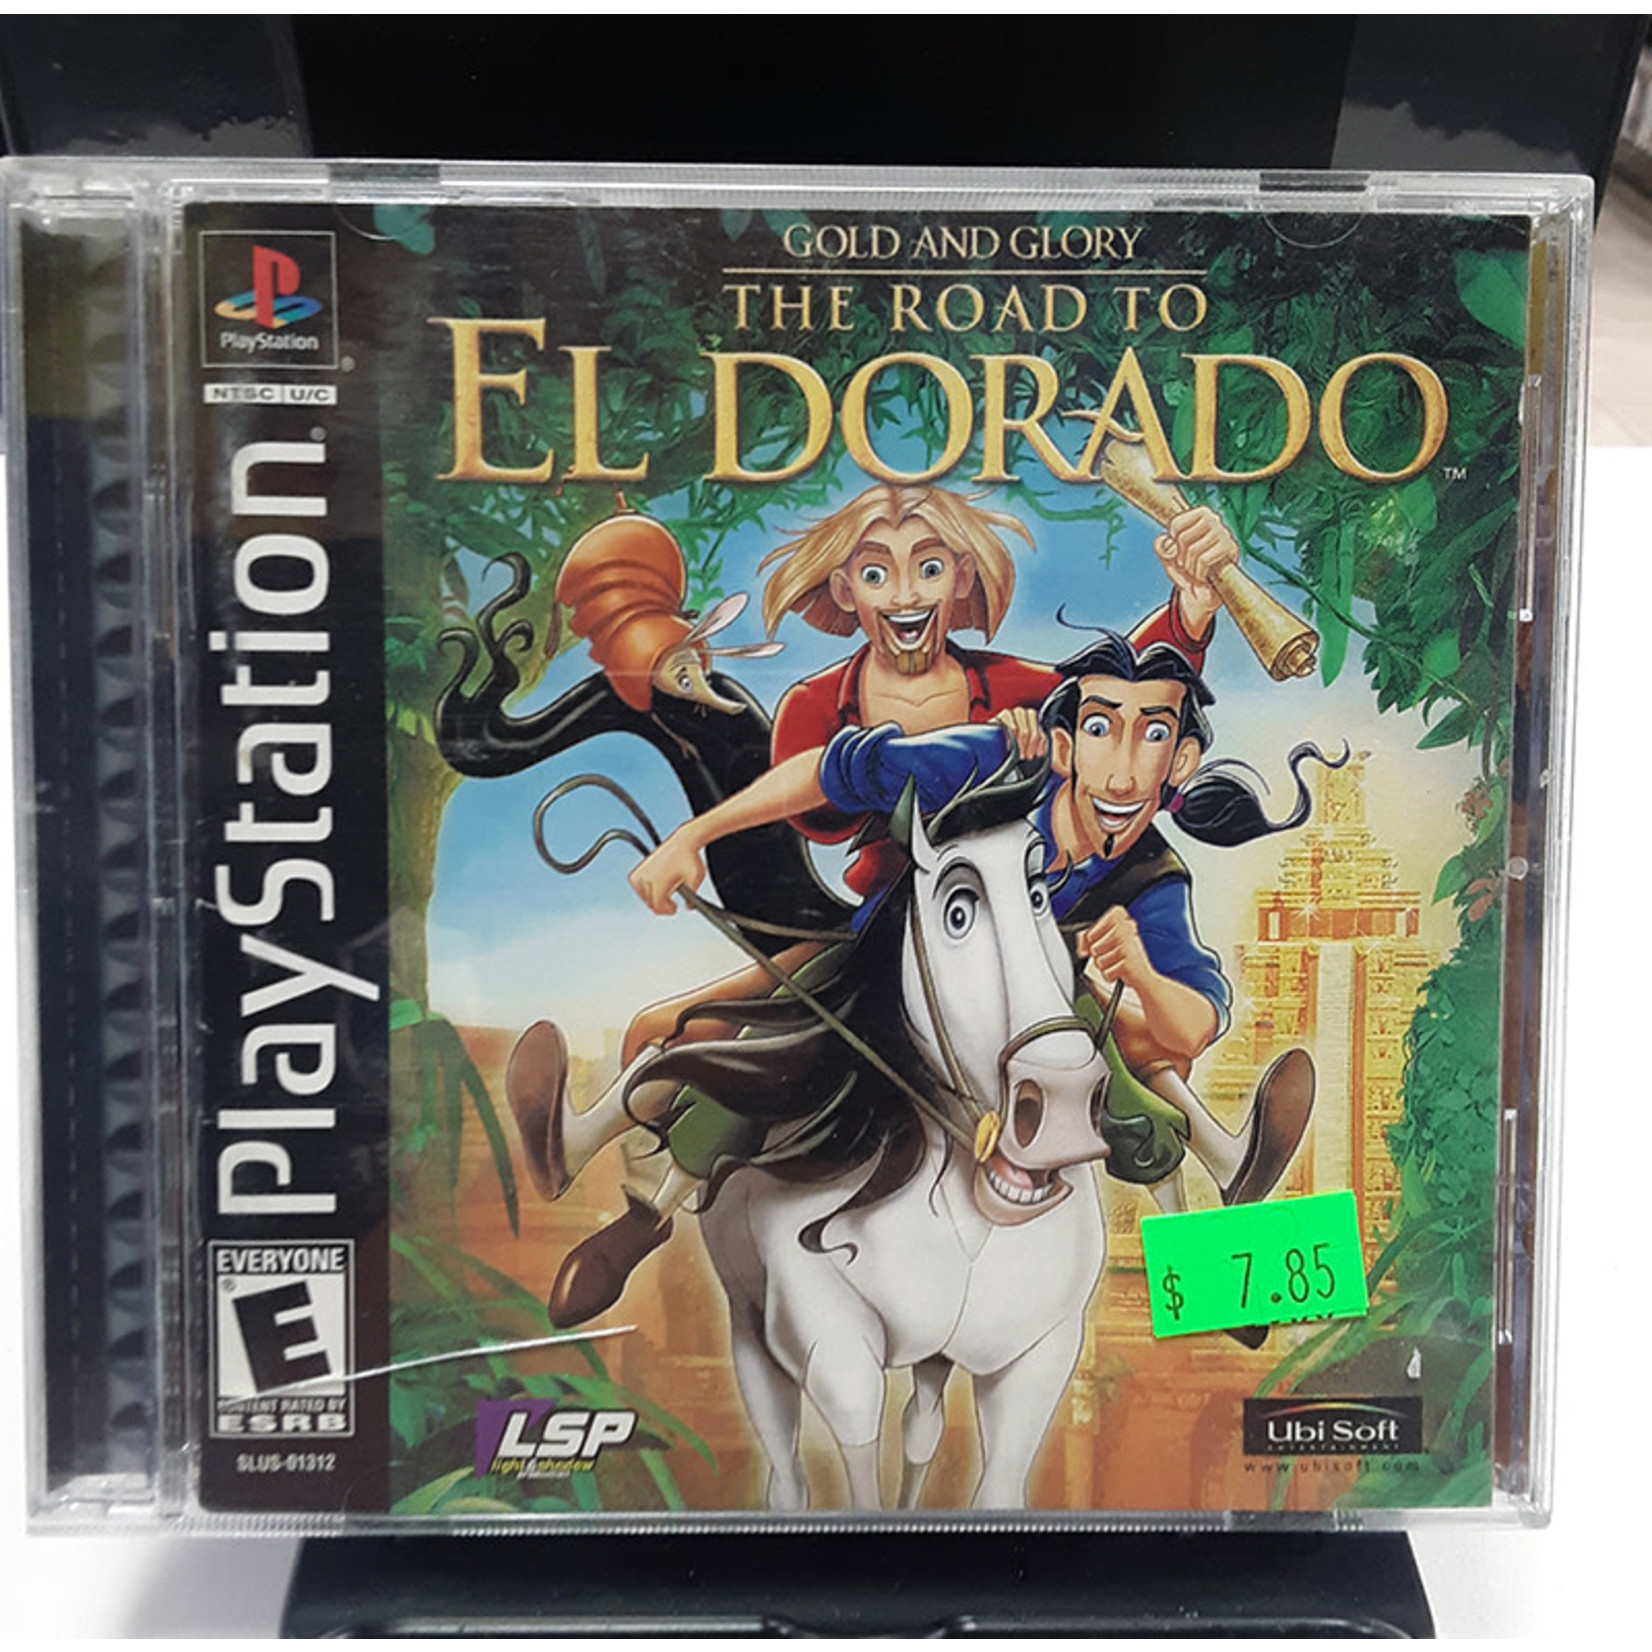 ps1u-Gold and Glory The Road to El Dorado